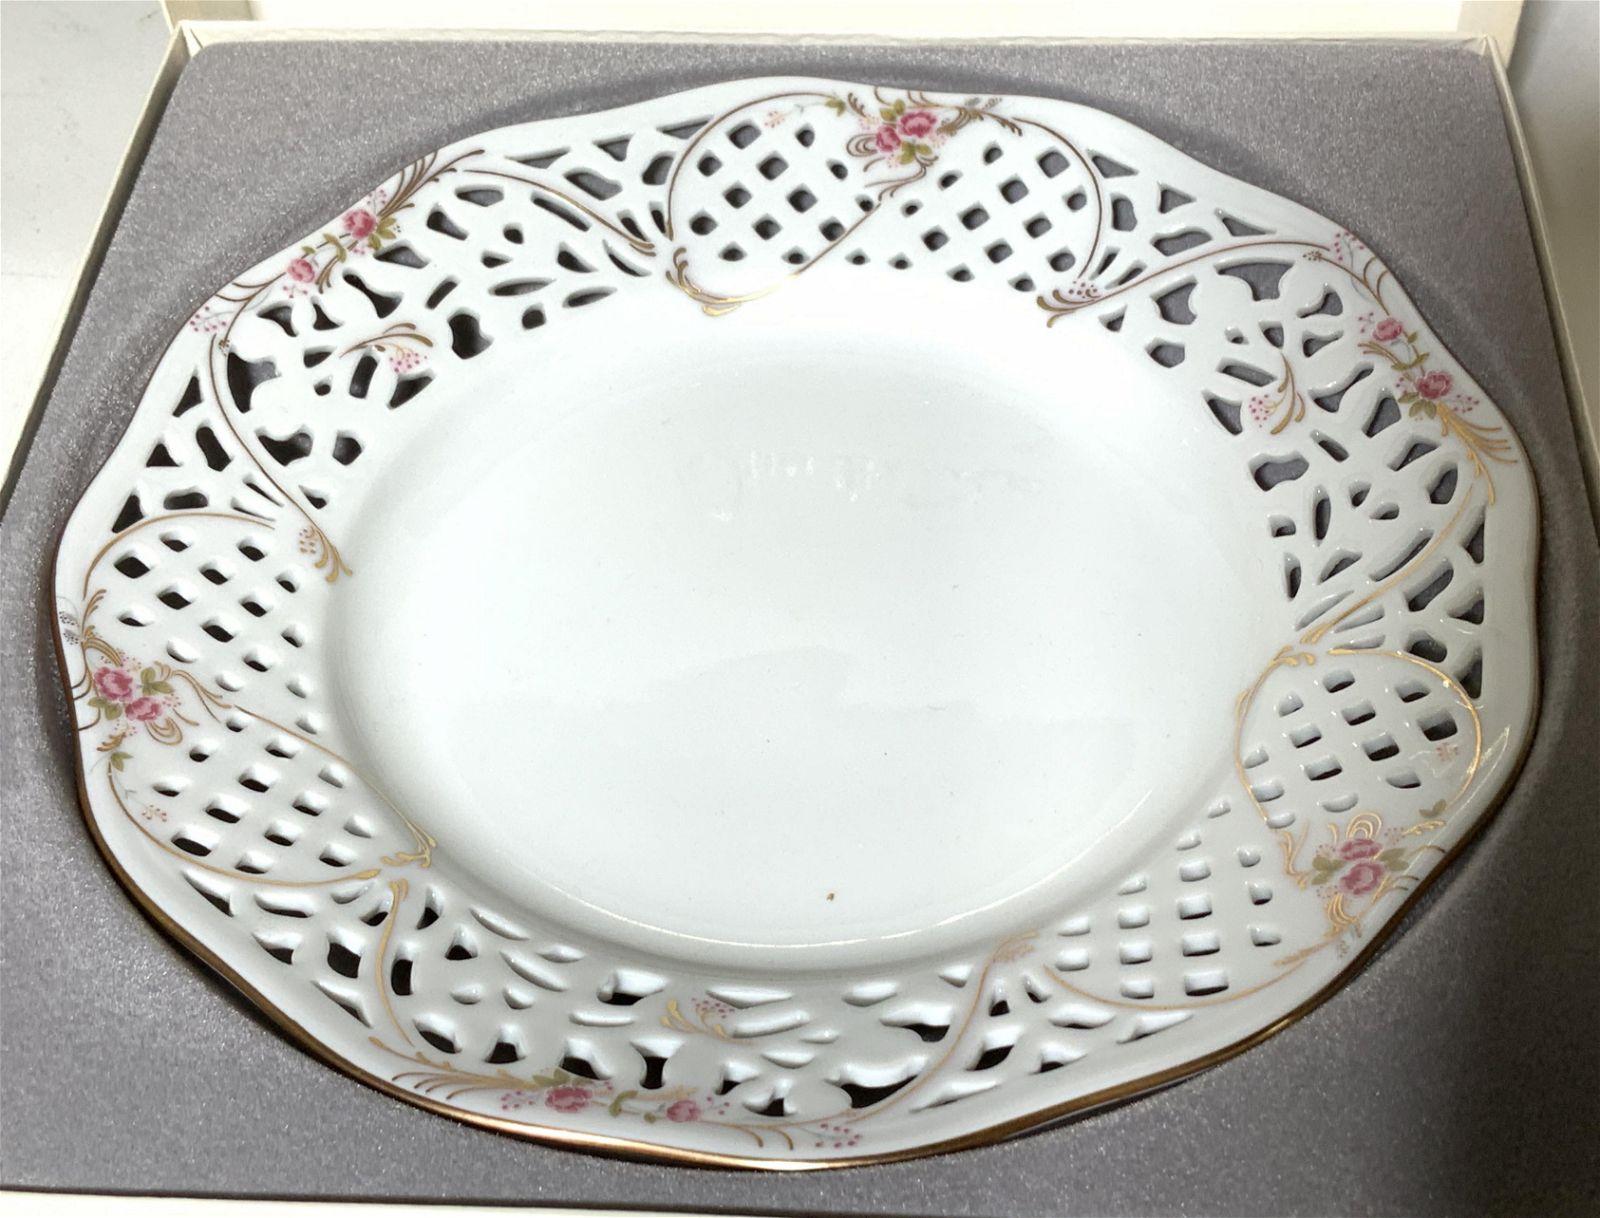 Oscar de la Renta Porcelain Plate in Original